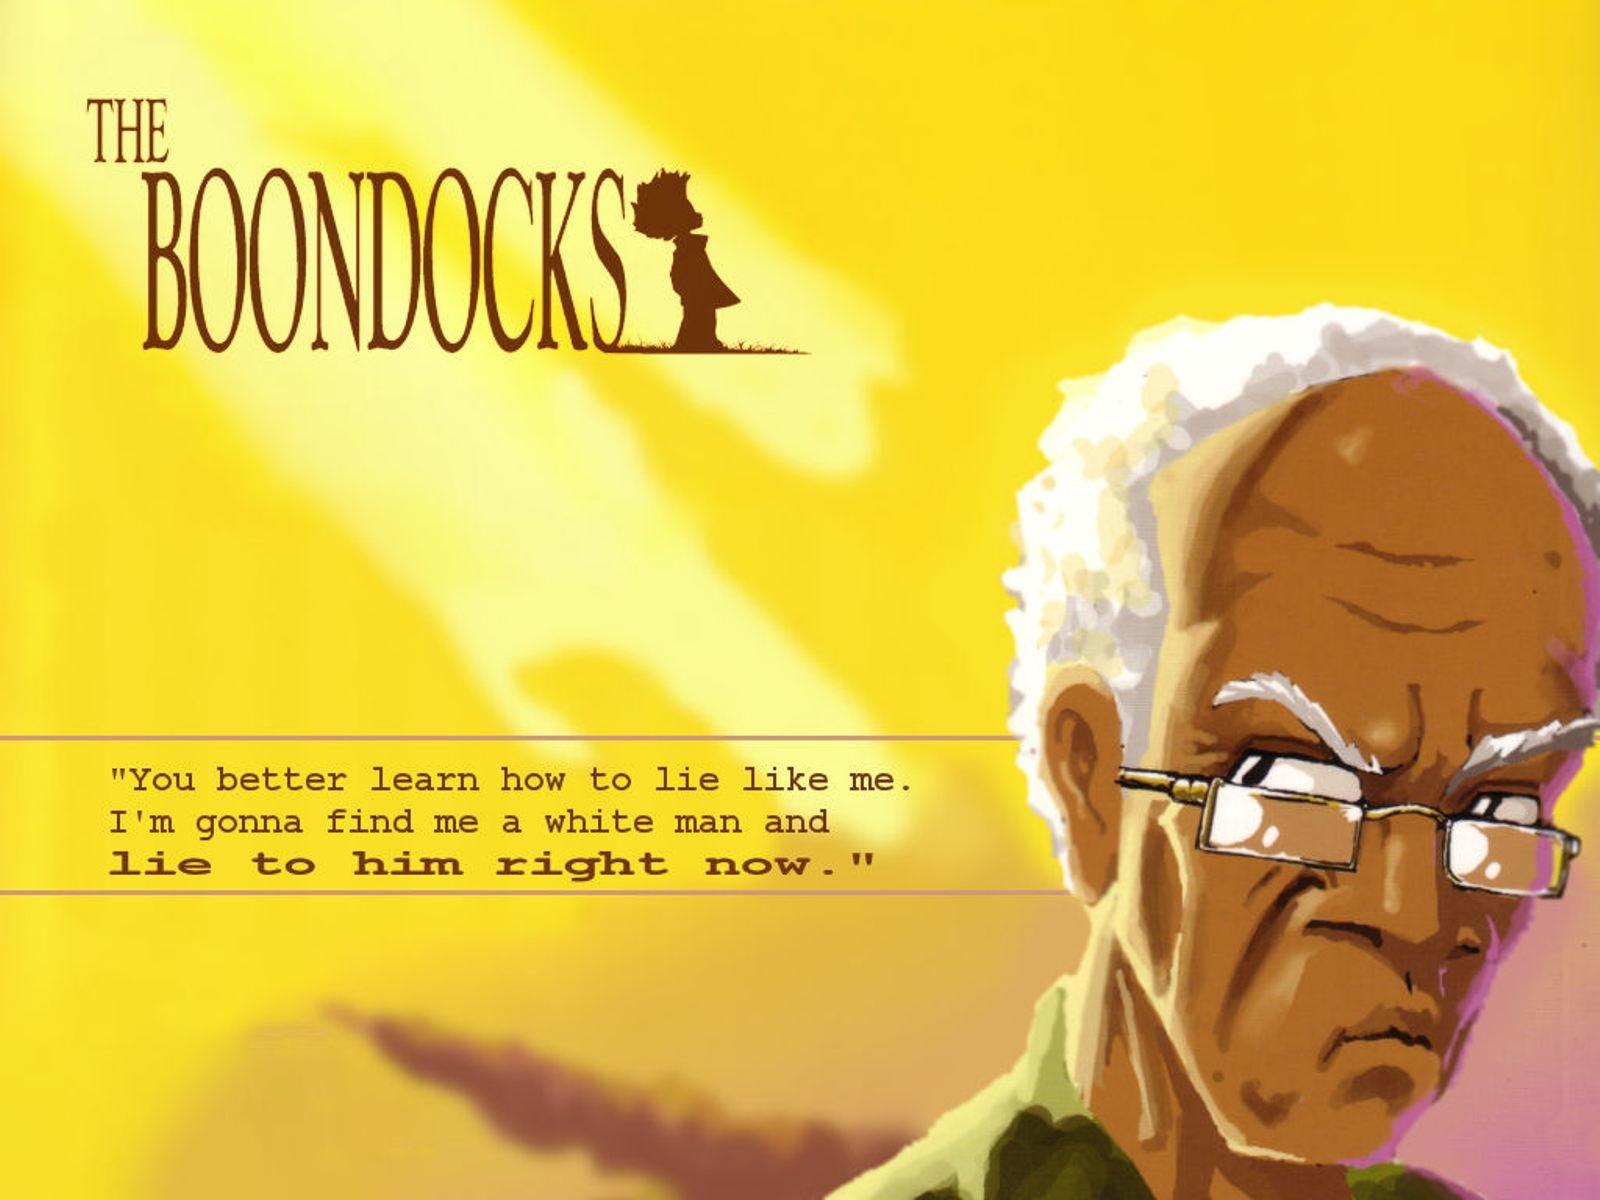 the boondocks background hd 1600x1200 271803